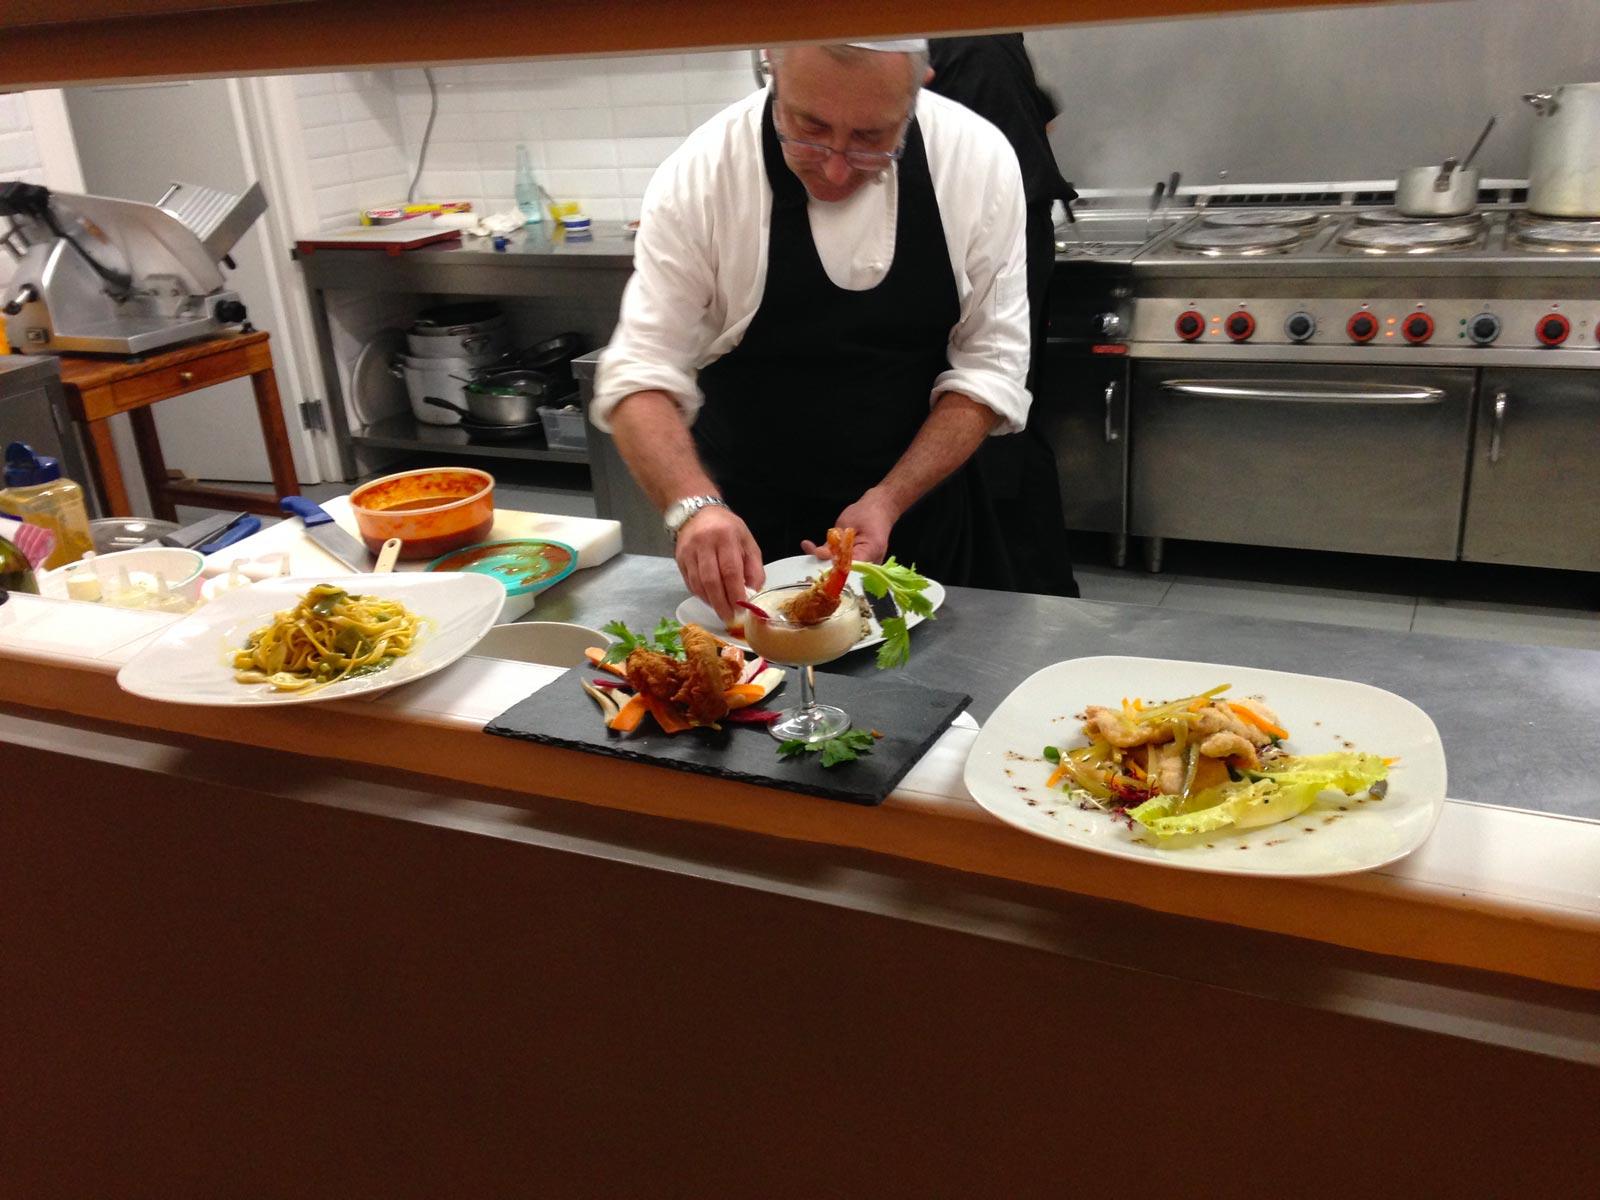 Osteria enoteca rabezzana cucina piemontese torino centro - Cucina piemontese torino ...